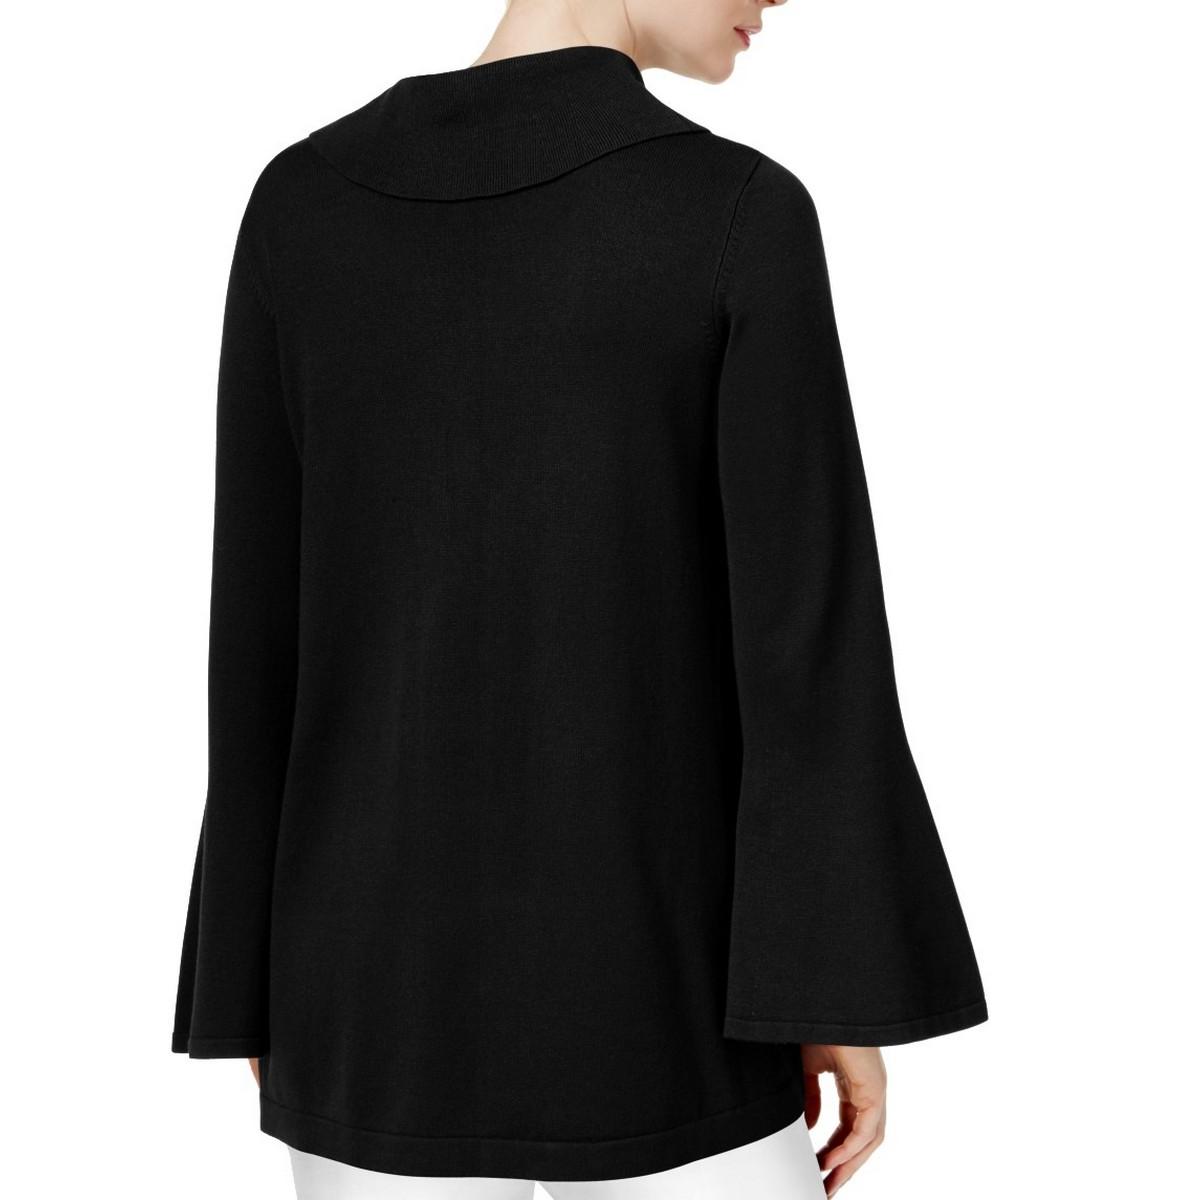 ALFANI-NEW-Women-039-s-Bell-sleeve-Cowl-Neck-Sweater-Top-TEDO thumbnail 6